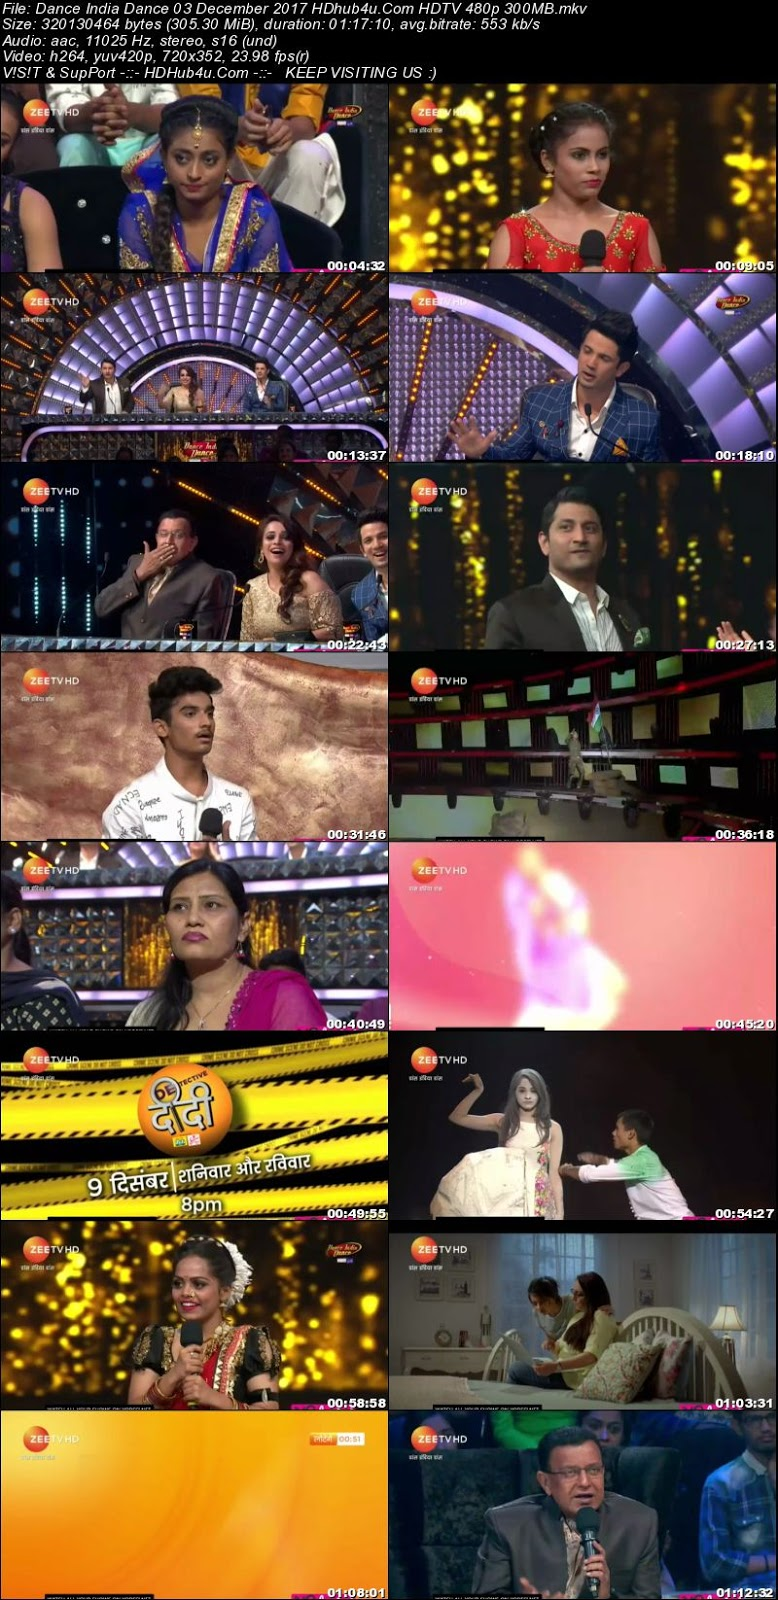 Dance India Dance 03 December 2017 480p HDTV 300MB Download